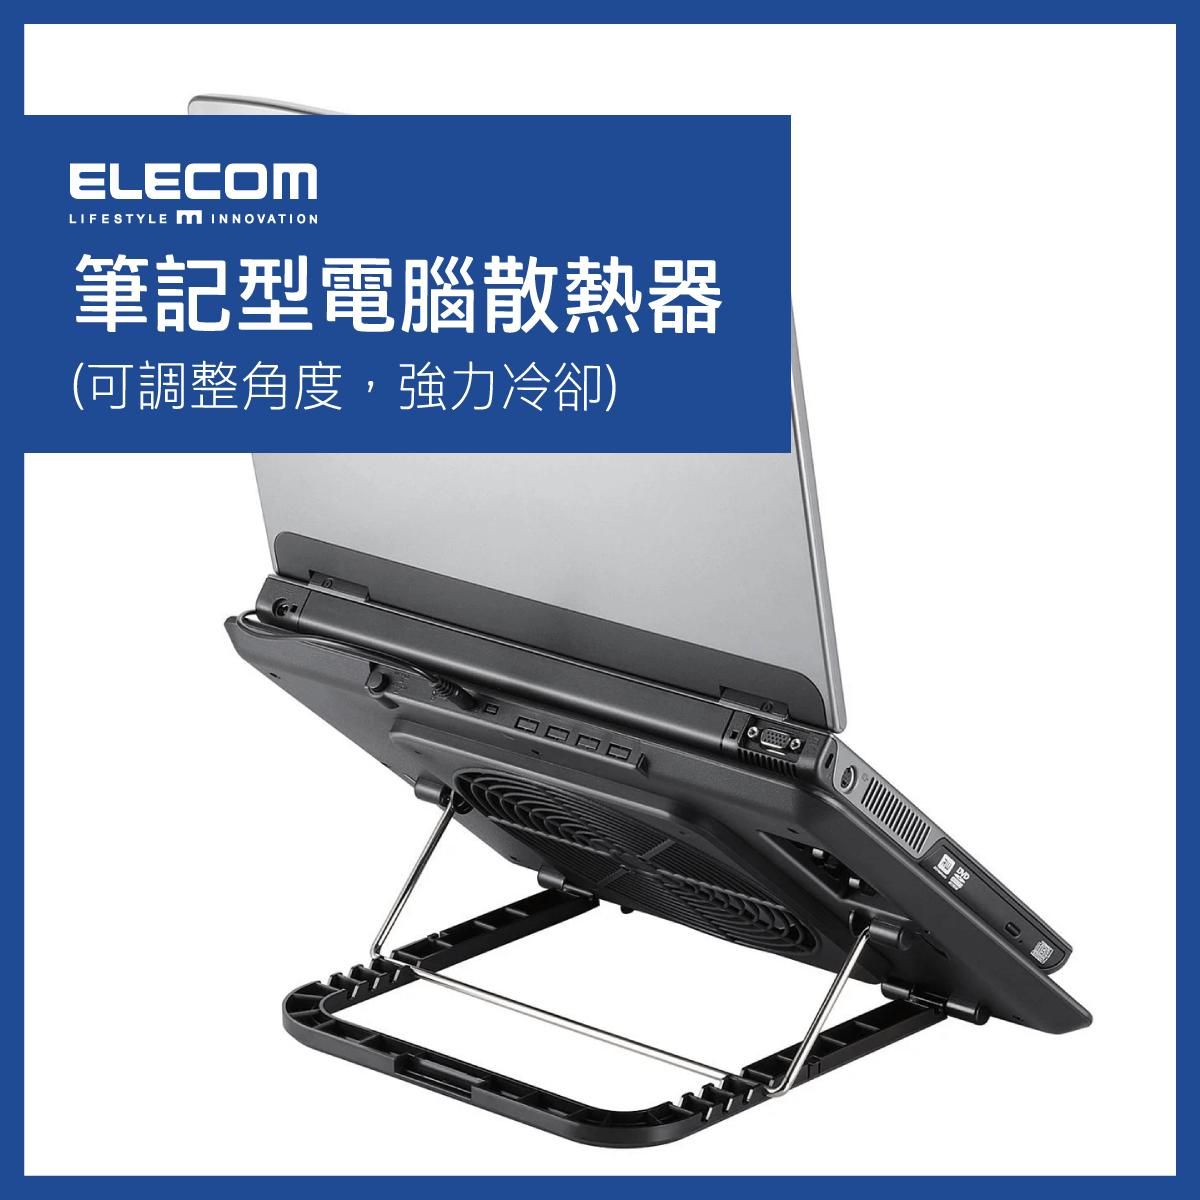 ELECOM Laptop Cooling pad - Silver